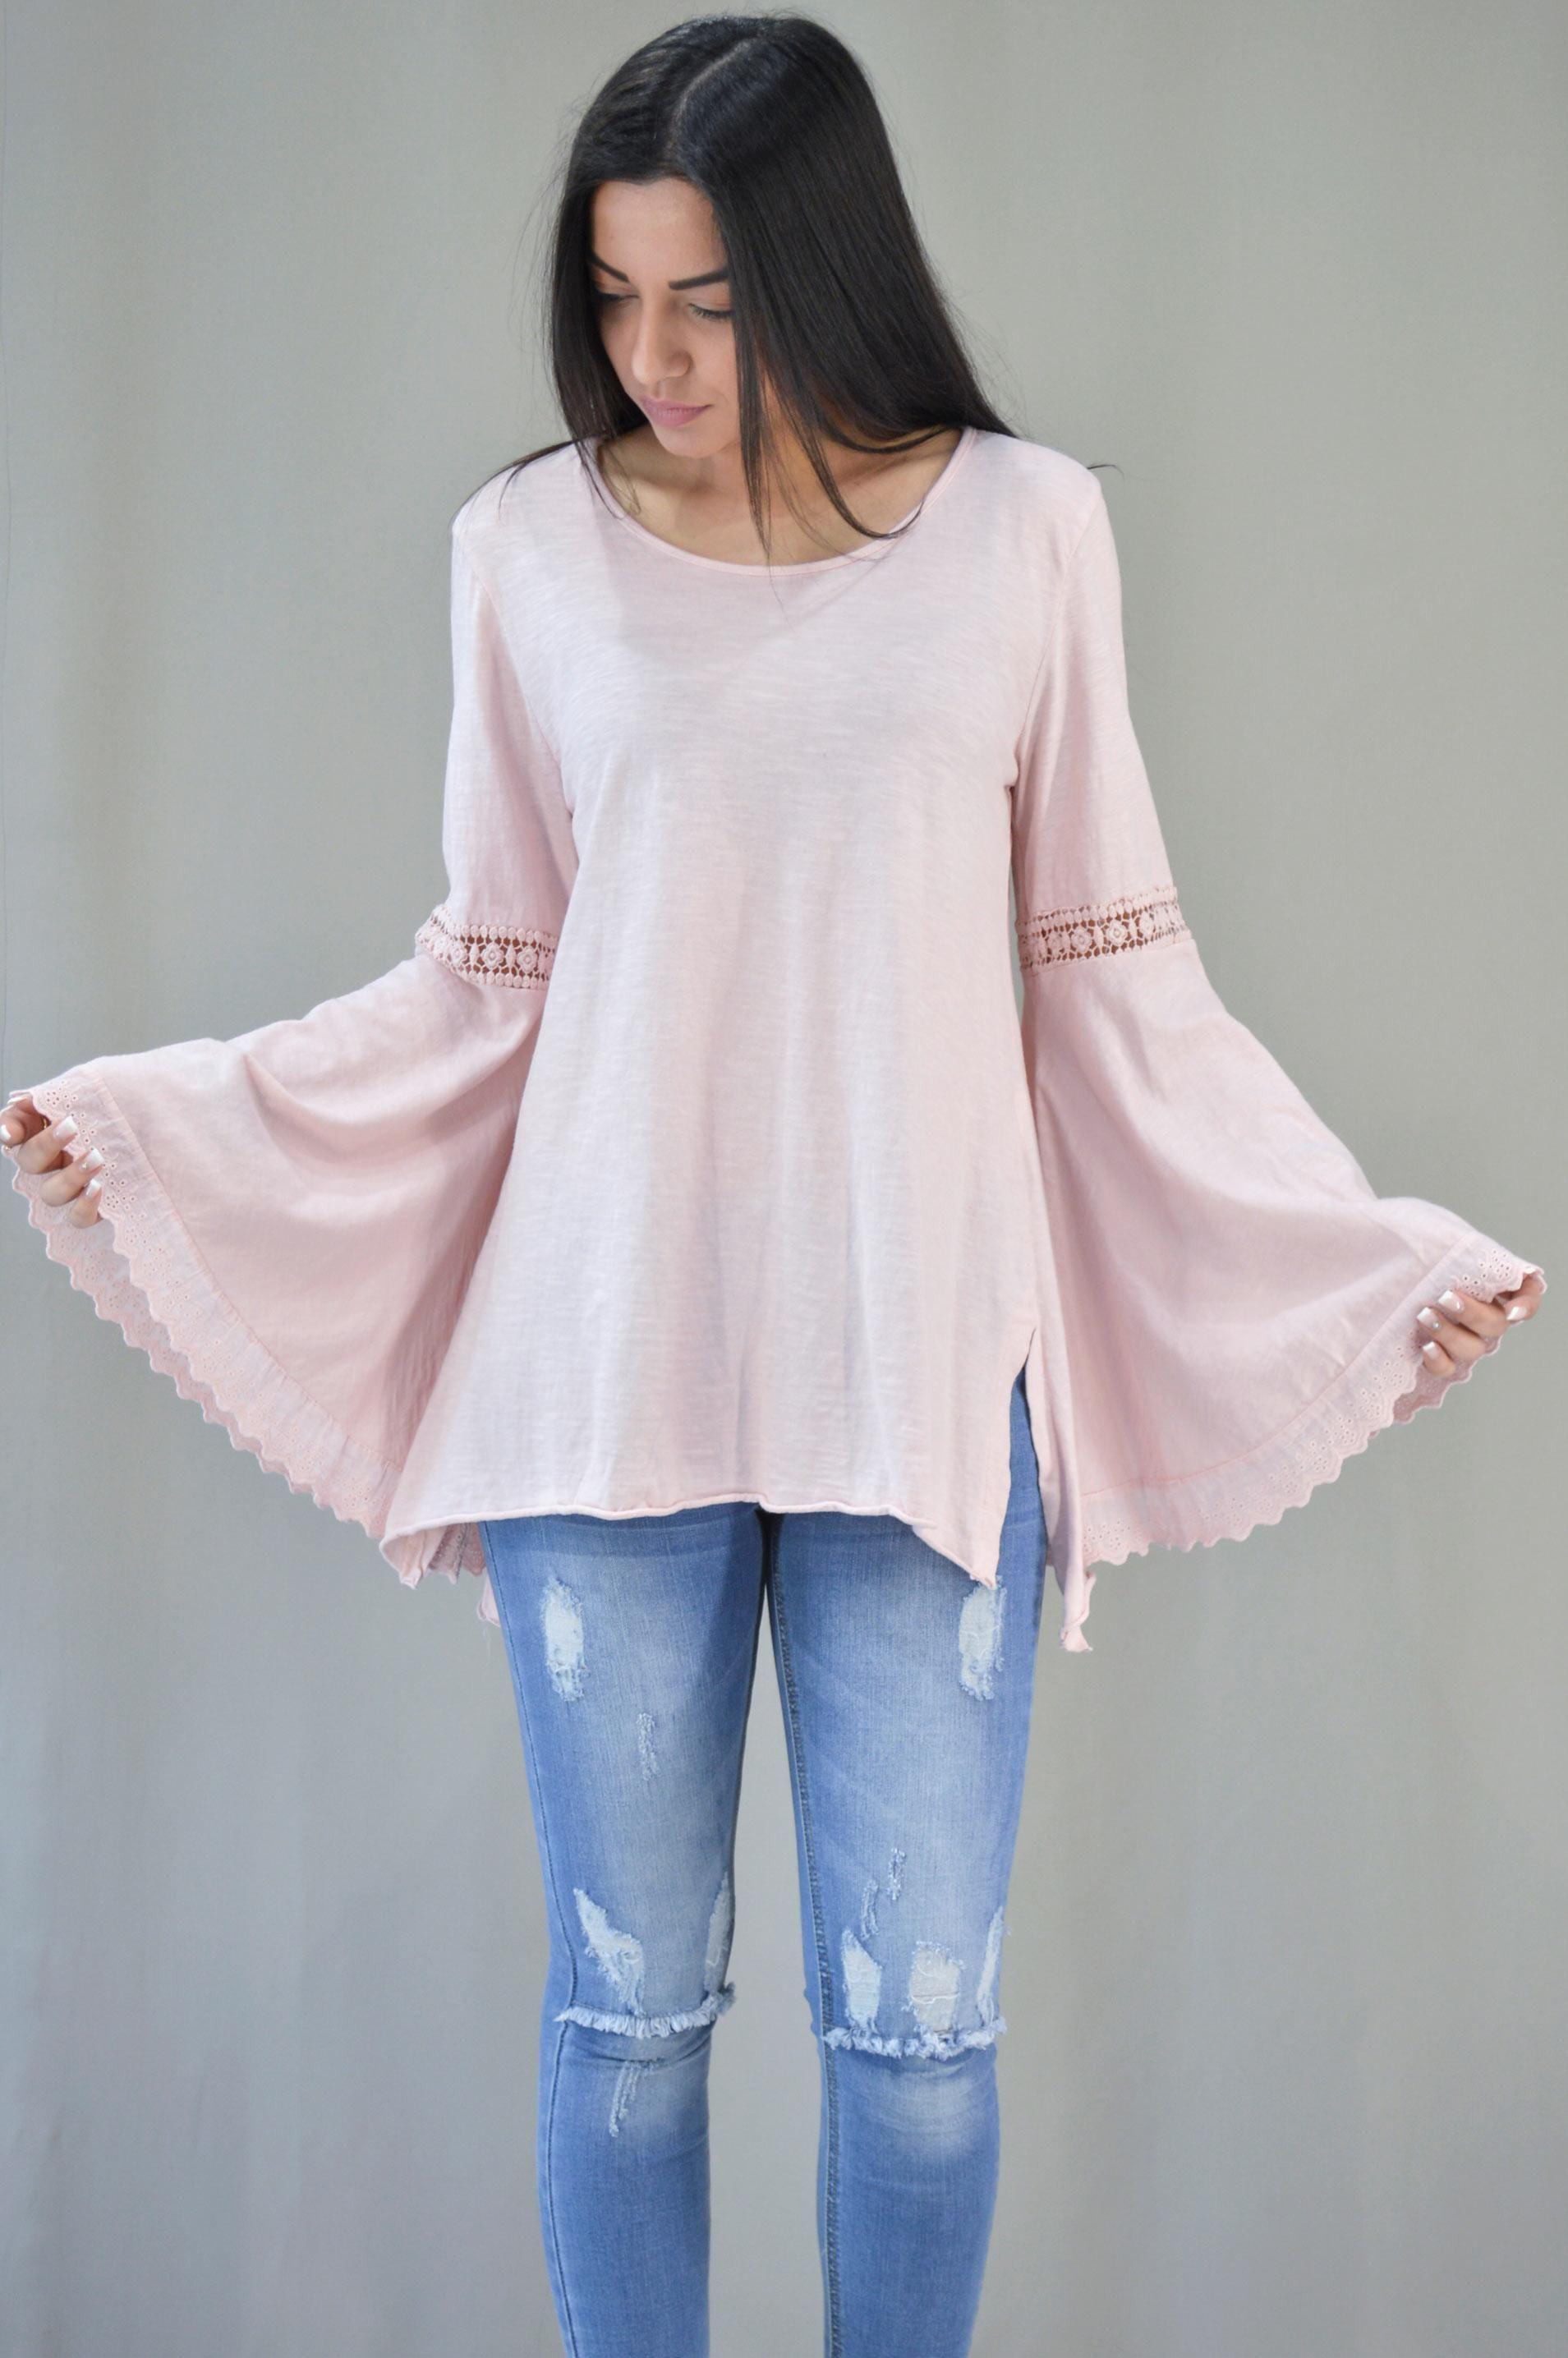 b158a724980f Γυναικεία μπλούζα με καμπάνα μανίκι